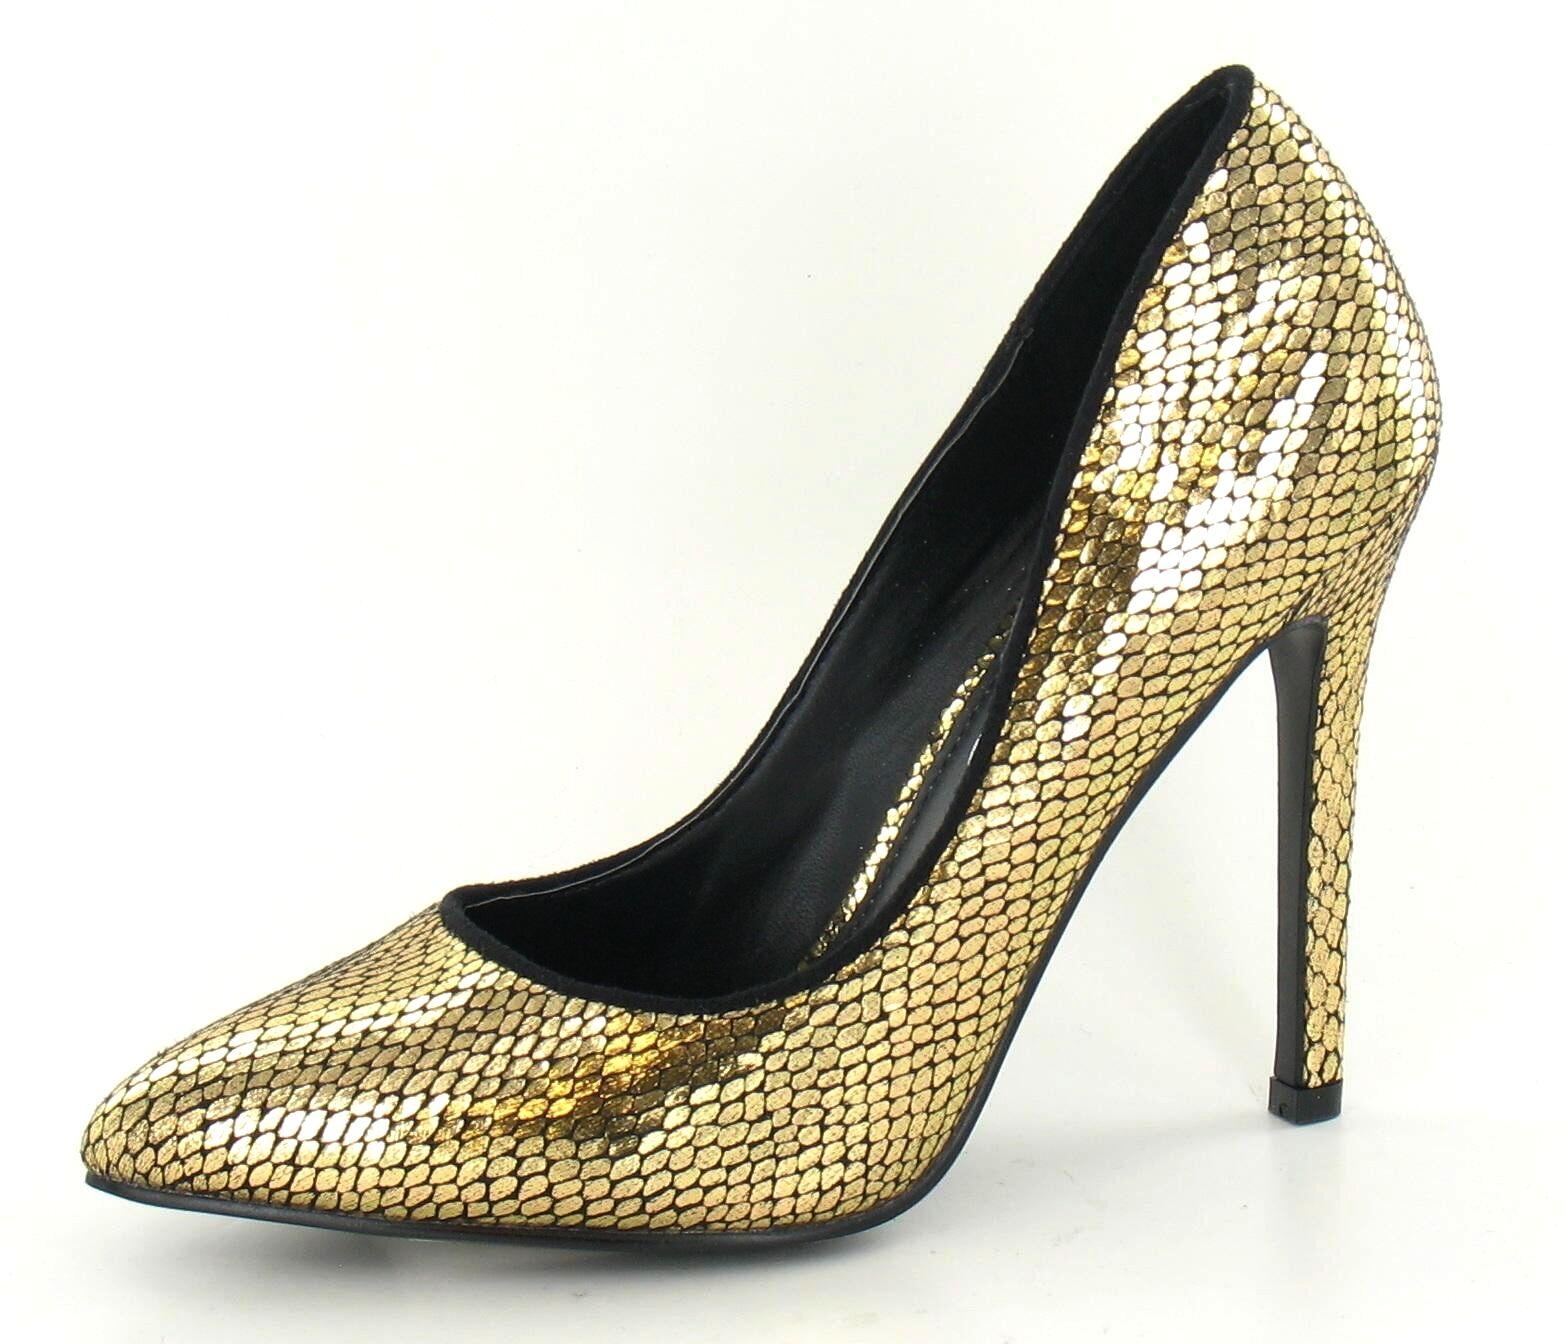 "Moda jest prosta i niedroga SALE Gold 4.5"" Stiletto Heel Metallic Party Court Shoes Spot On LIMITED STOCK"